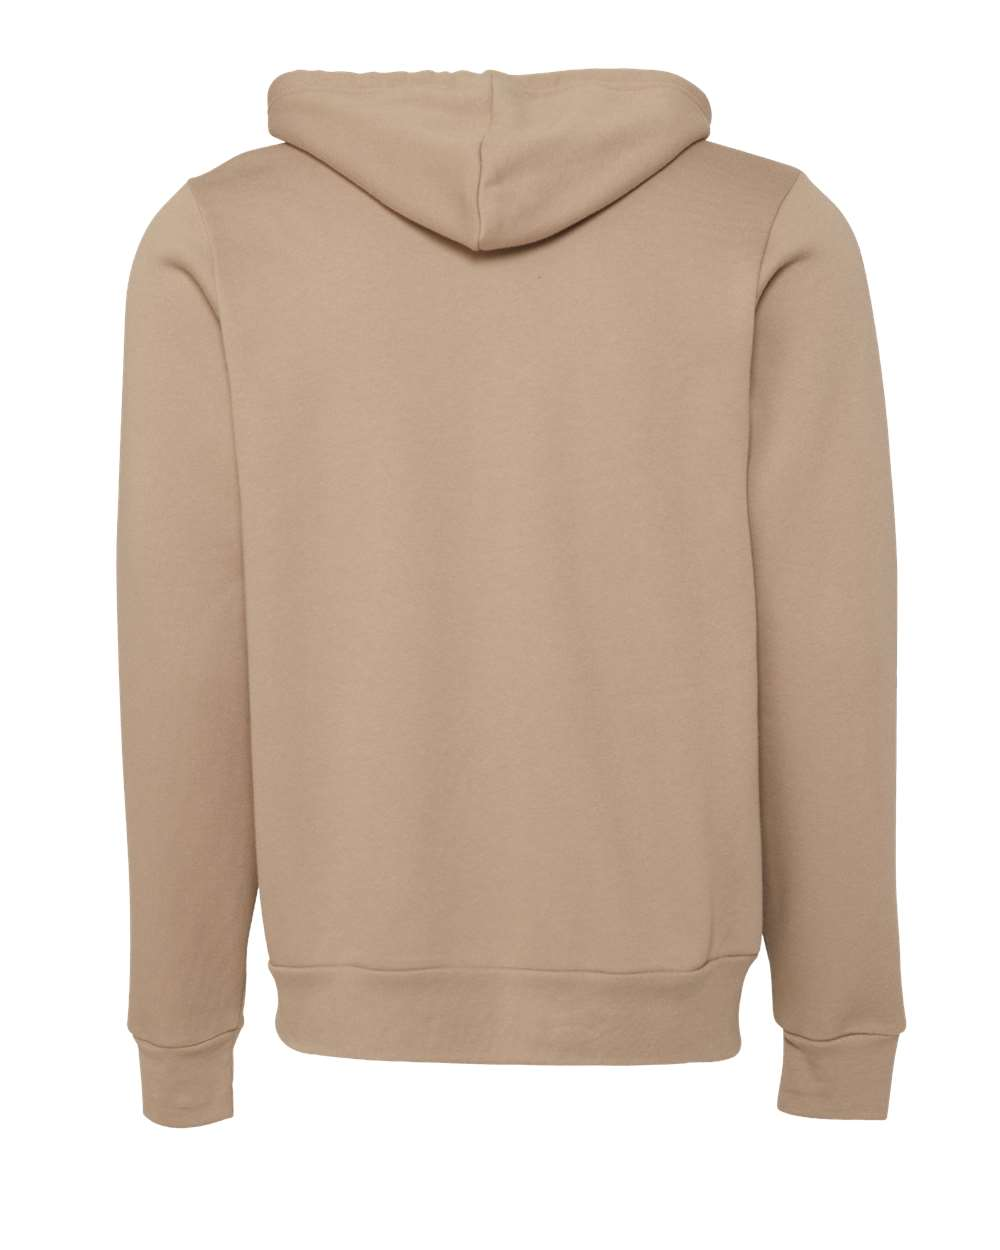 Bella-Canvas-Unisex-Full-Zip-Up-Hooded-Sweatshirt-Blank-Hoodie-3739-up-to-3XL thumbnail 83